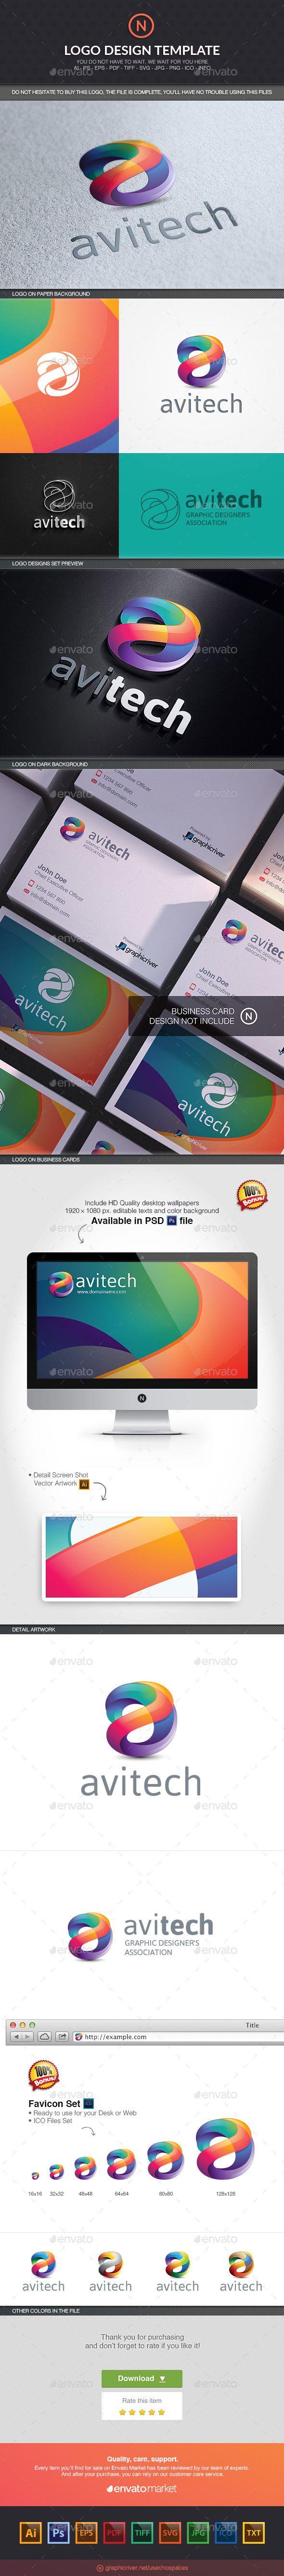 Logosmartz custom logo maker 5 0 review and download - Avi Tech Software Logo Design Template Vector Logotype Download It Here Http